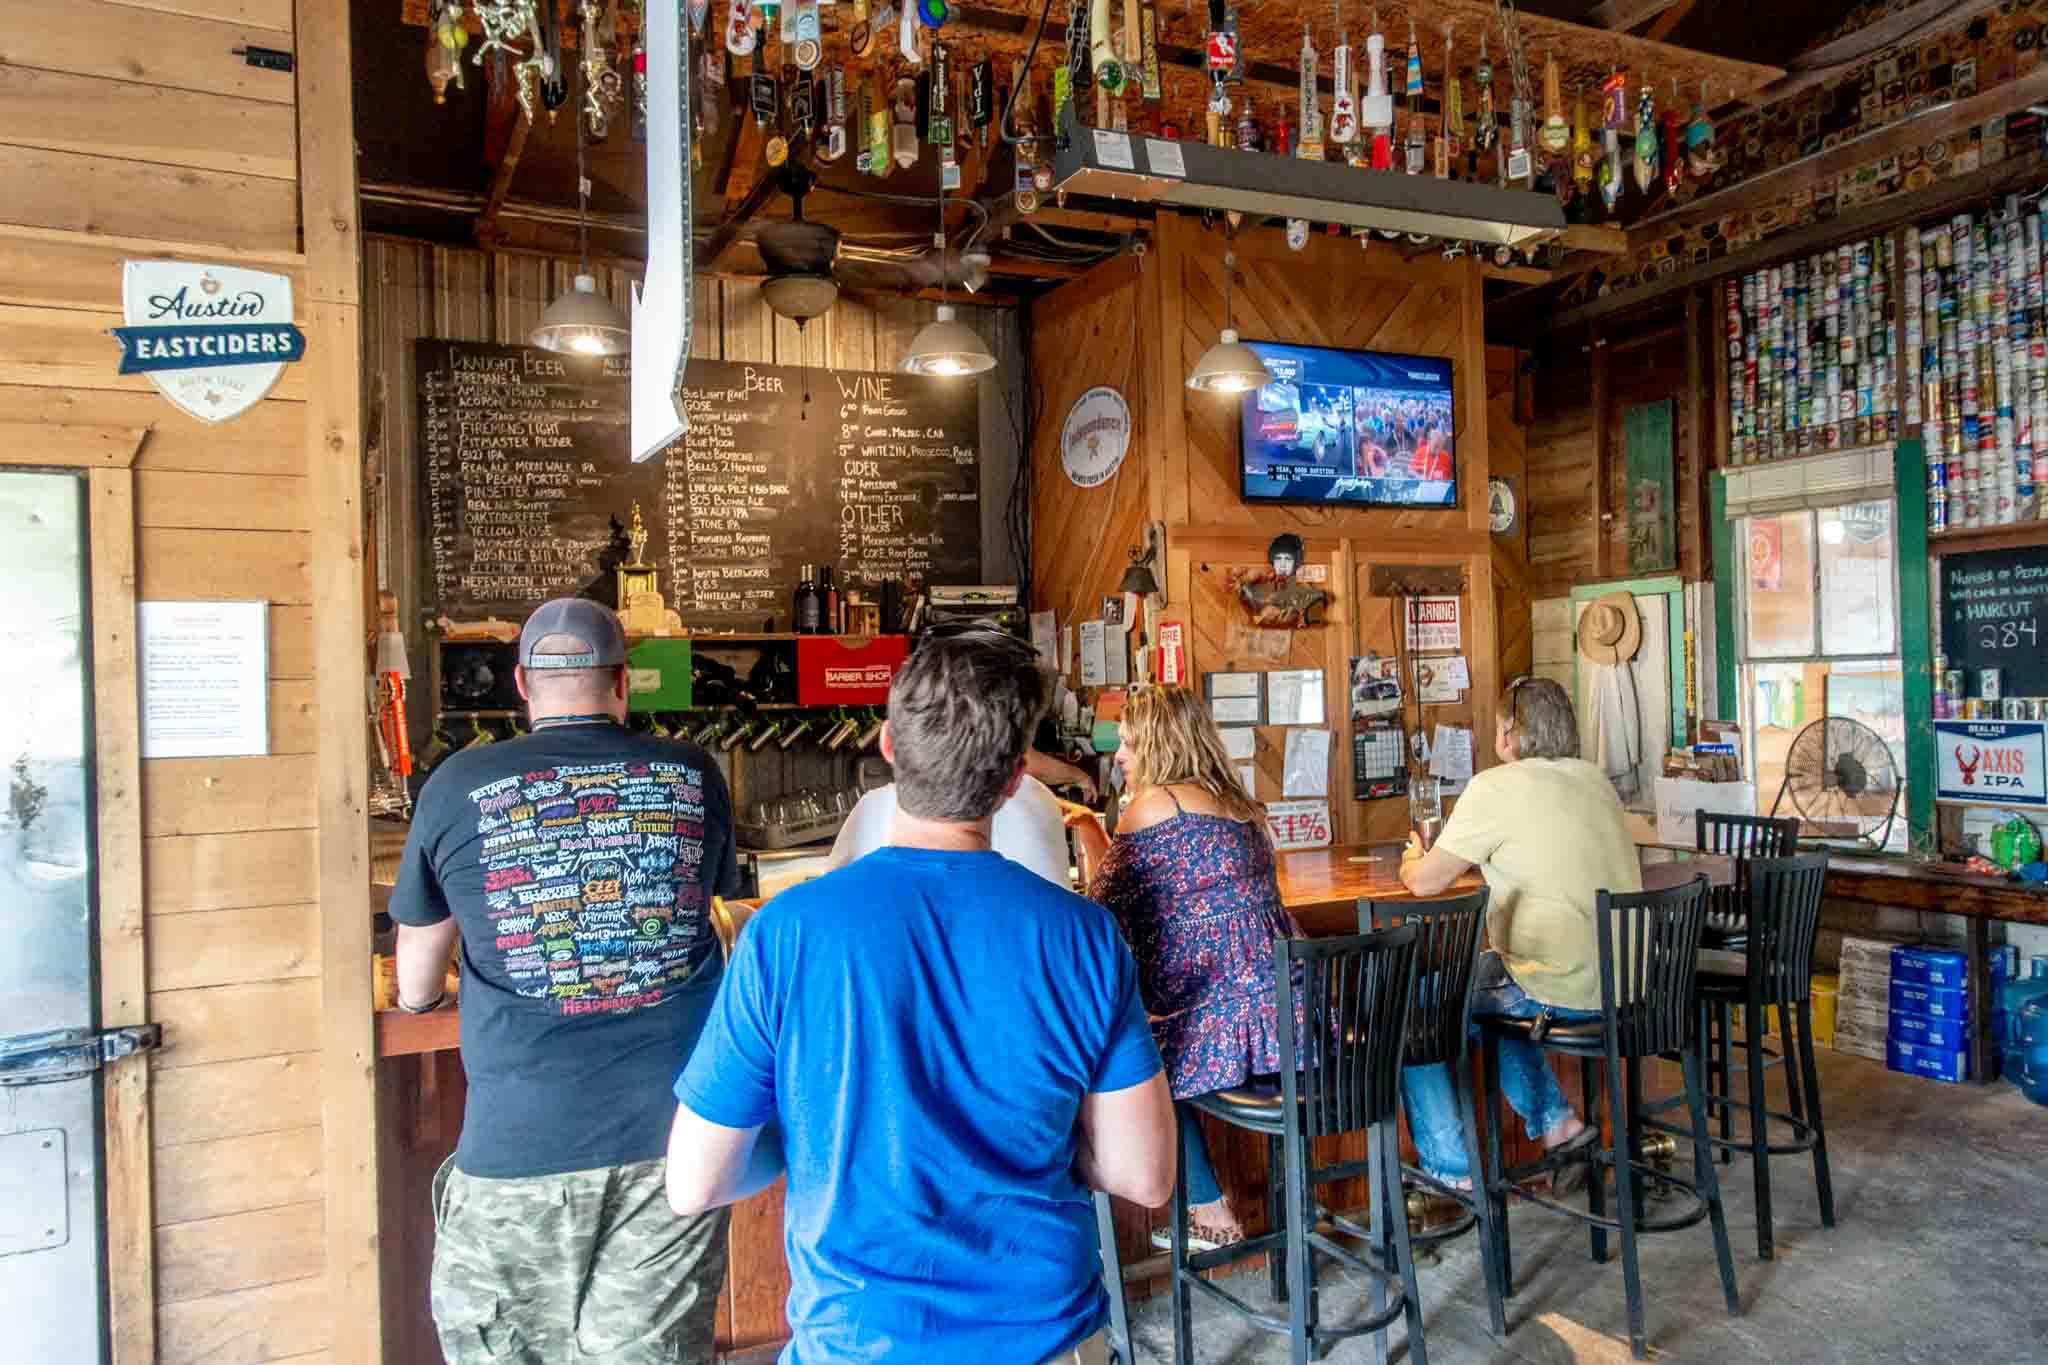 People at a beer bar